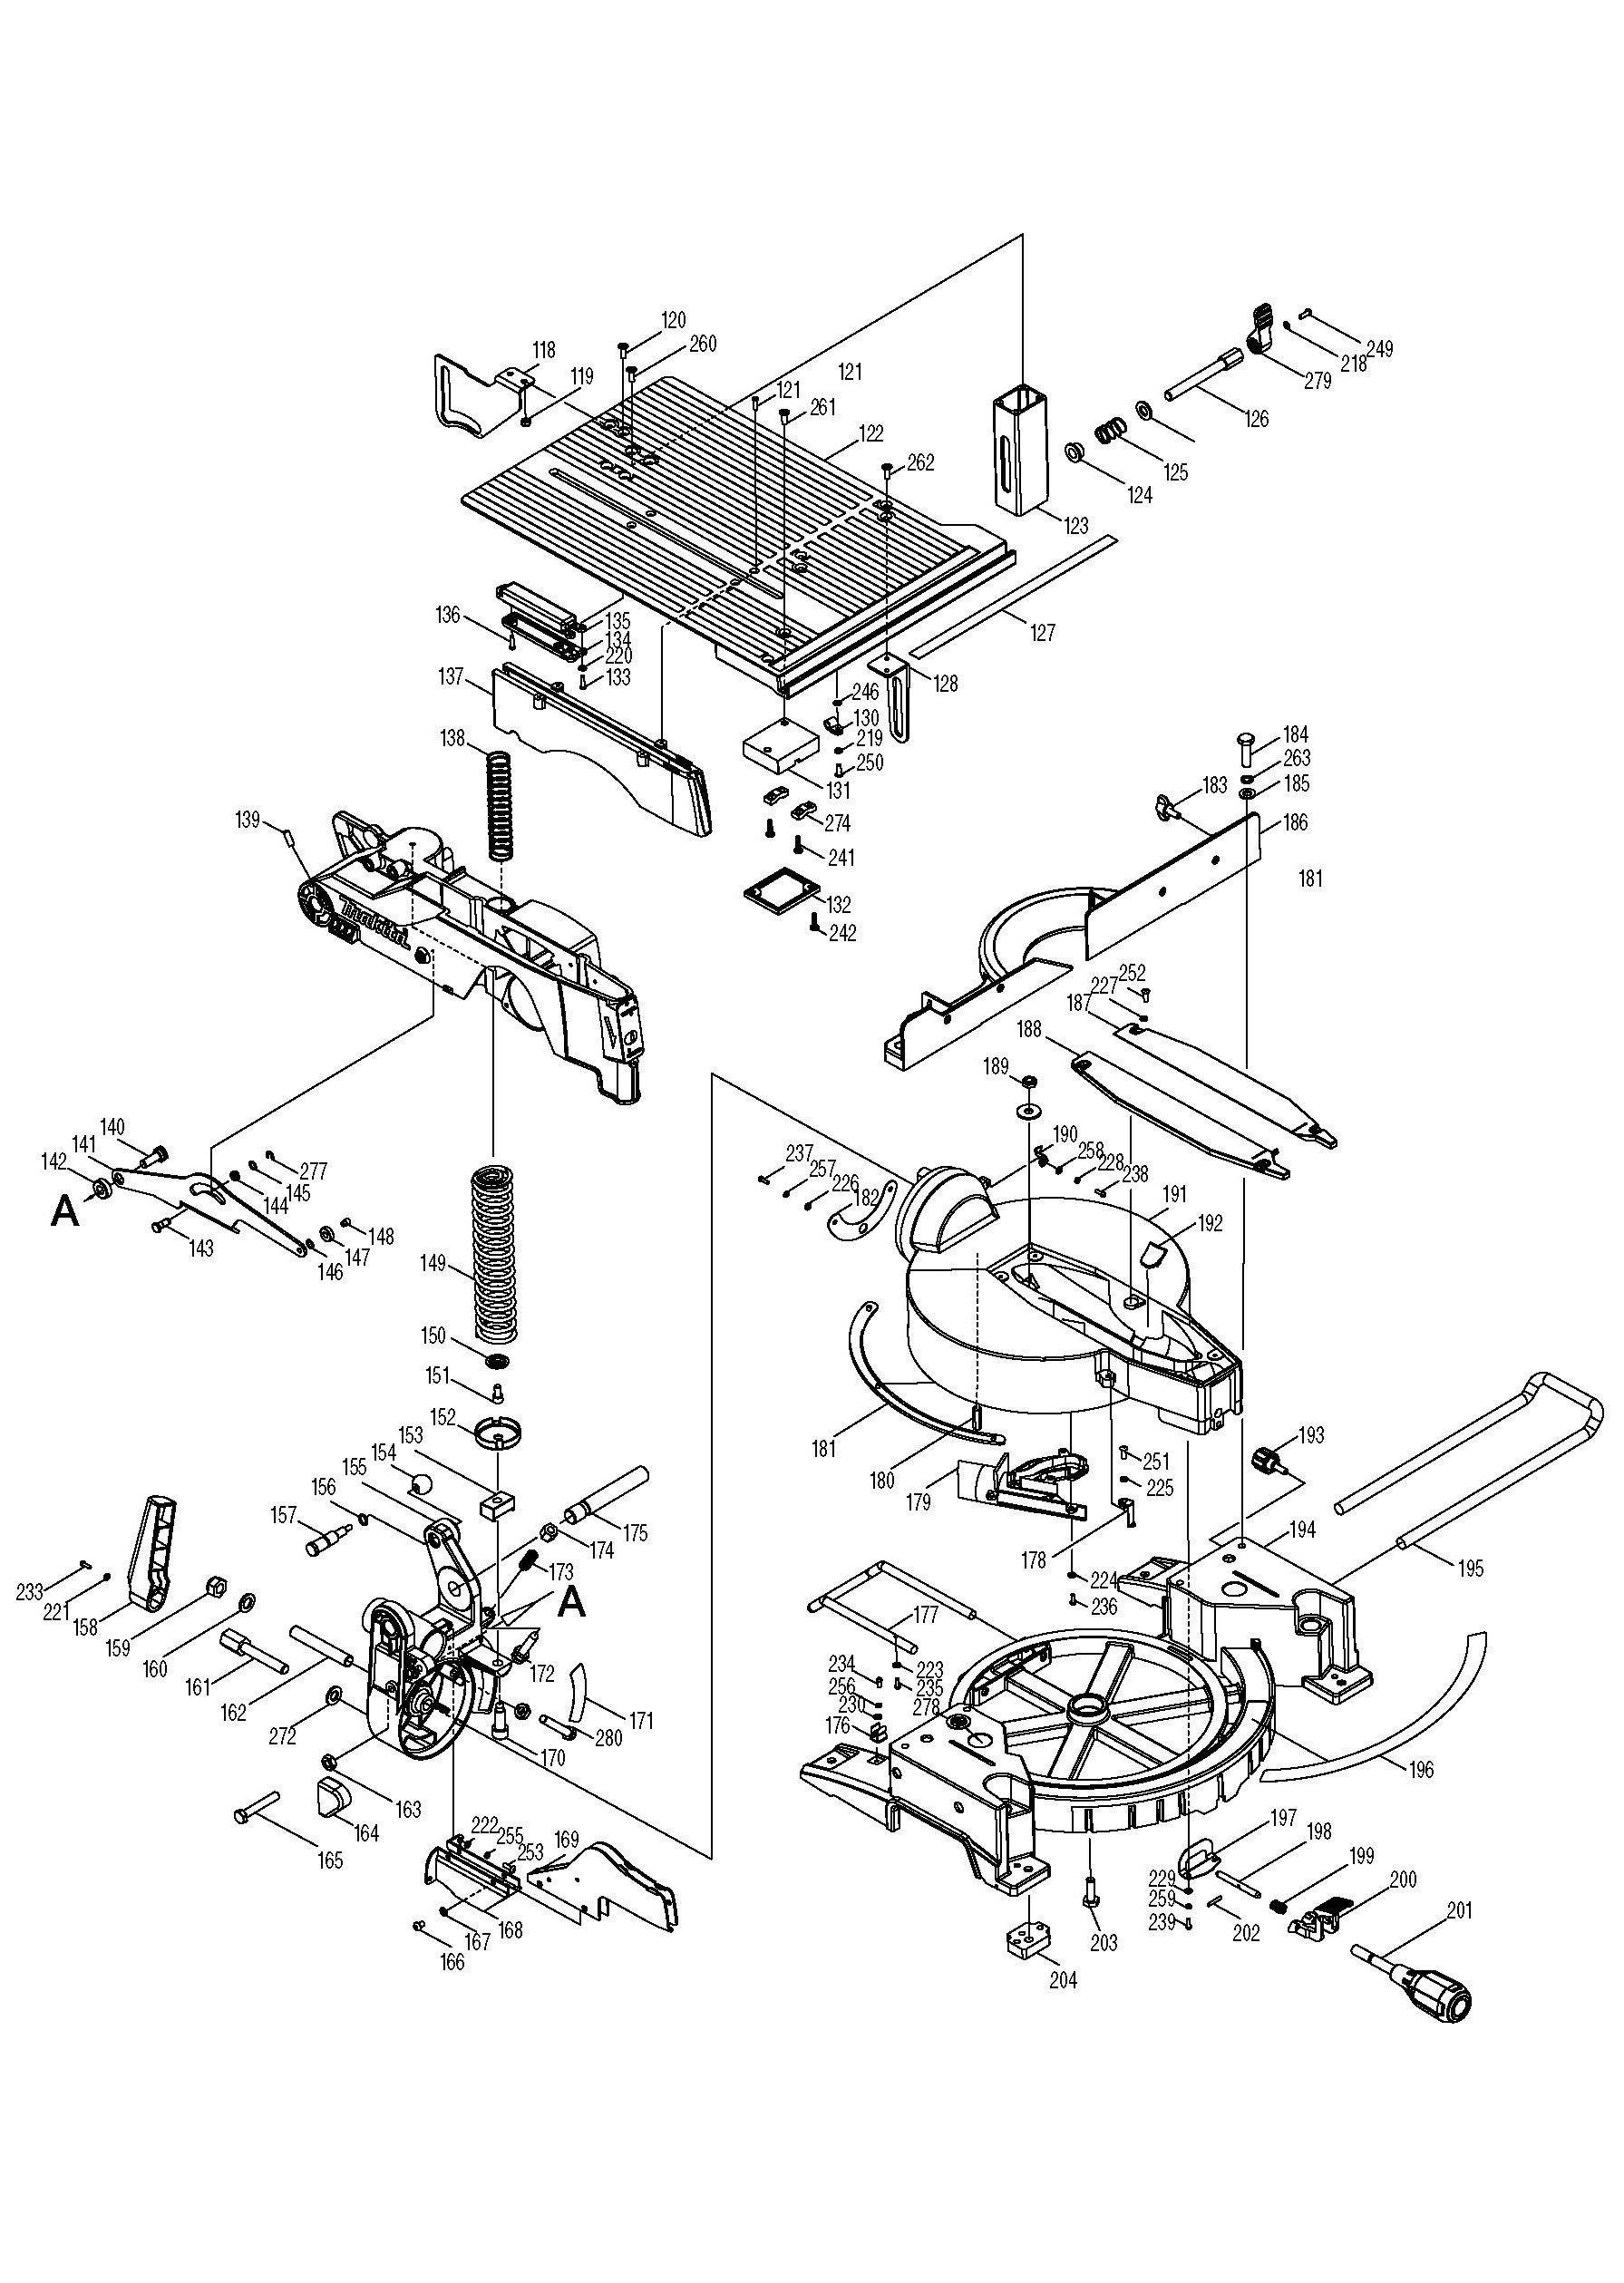 hight resolution of wiring diagrams milwaukee power tools milwaukee tools amazon makita angle grinder makita 4 inch angle grinder